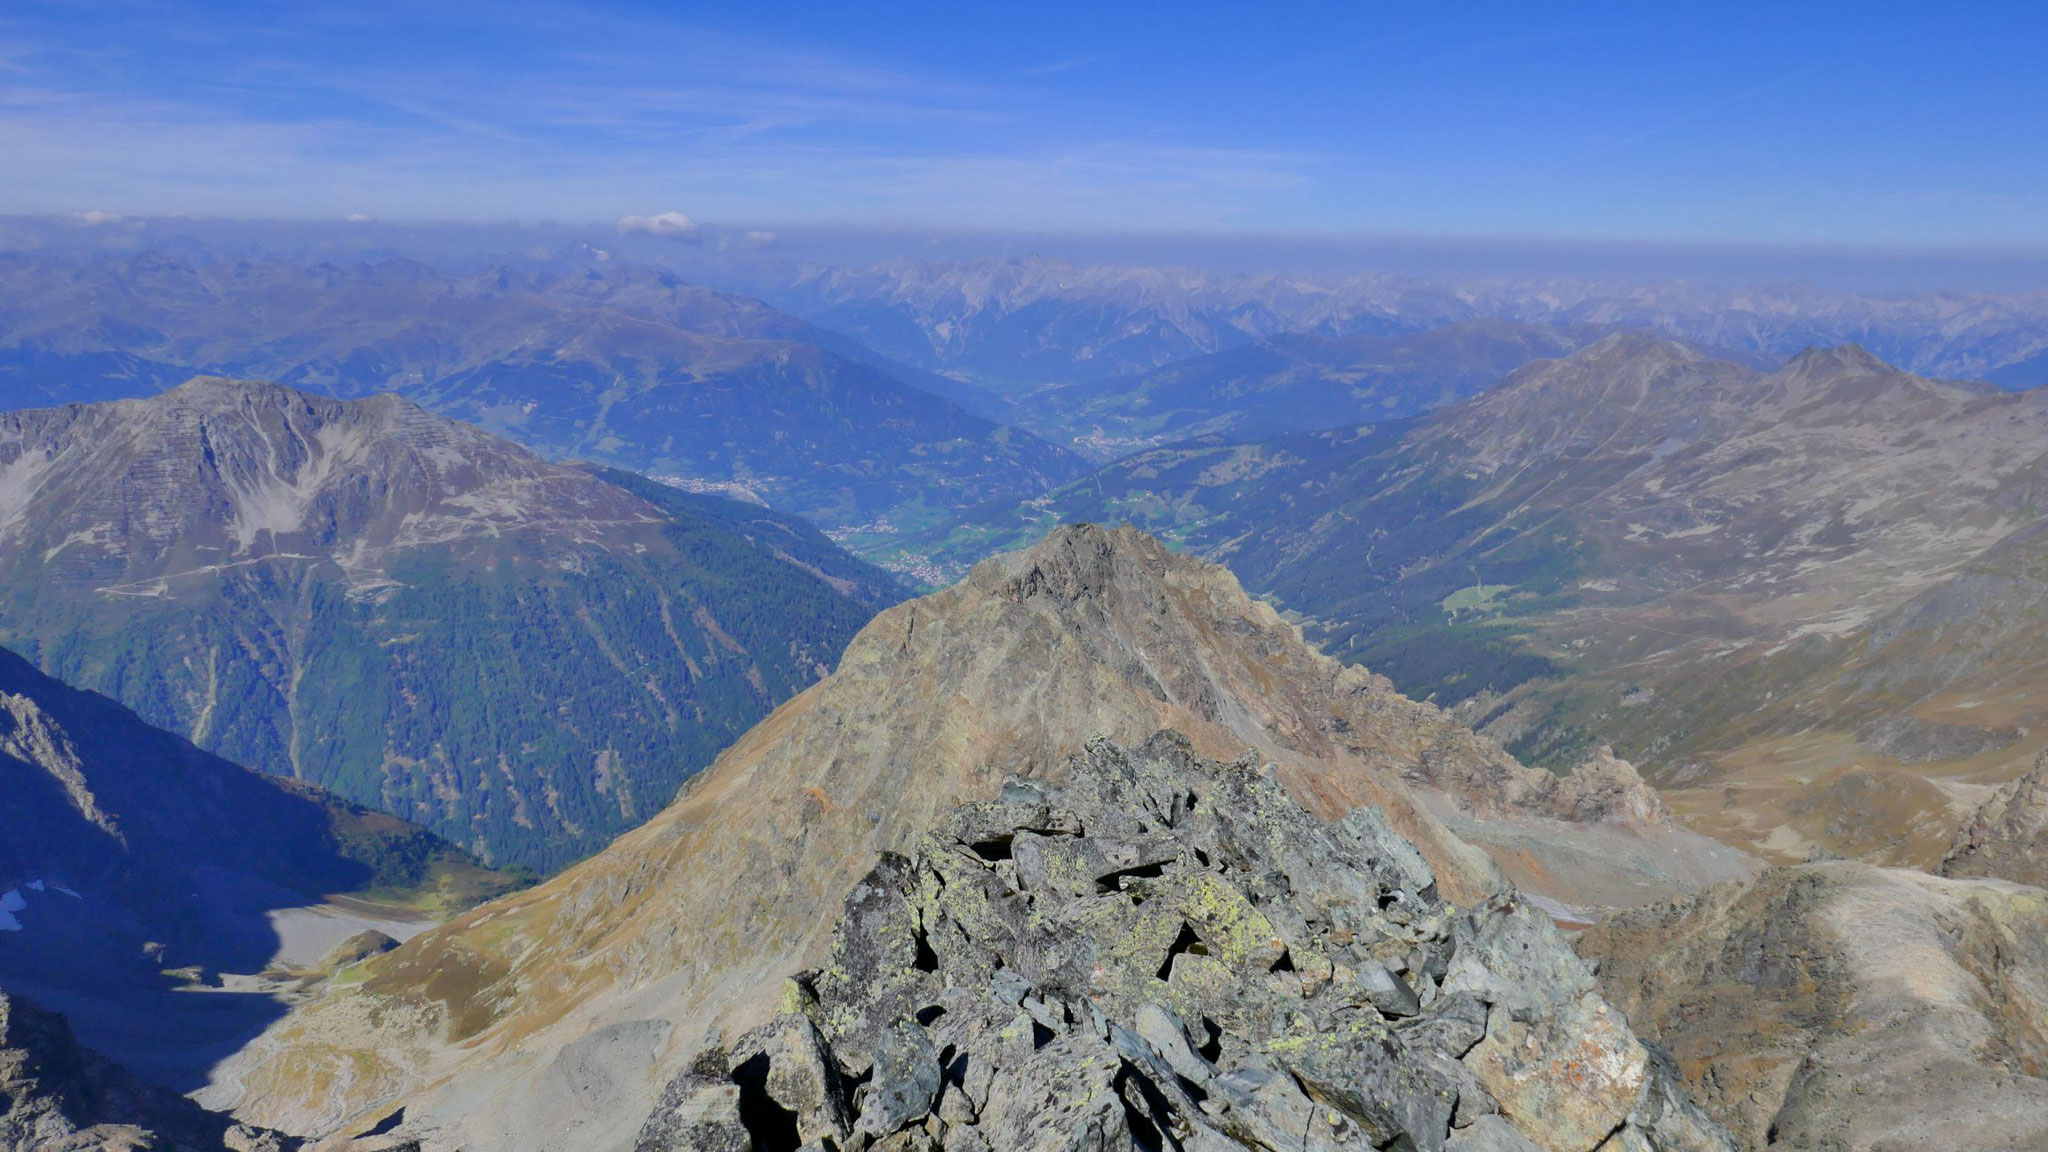 Links Skigebiet Serfaus-Fiss-Ladis, dahinter Verwall und Lechtaler